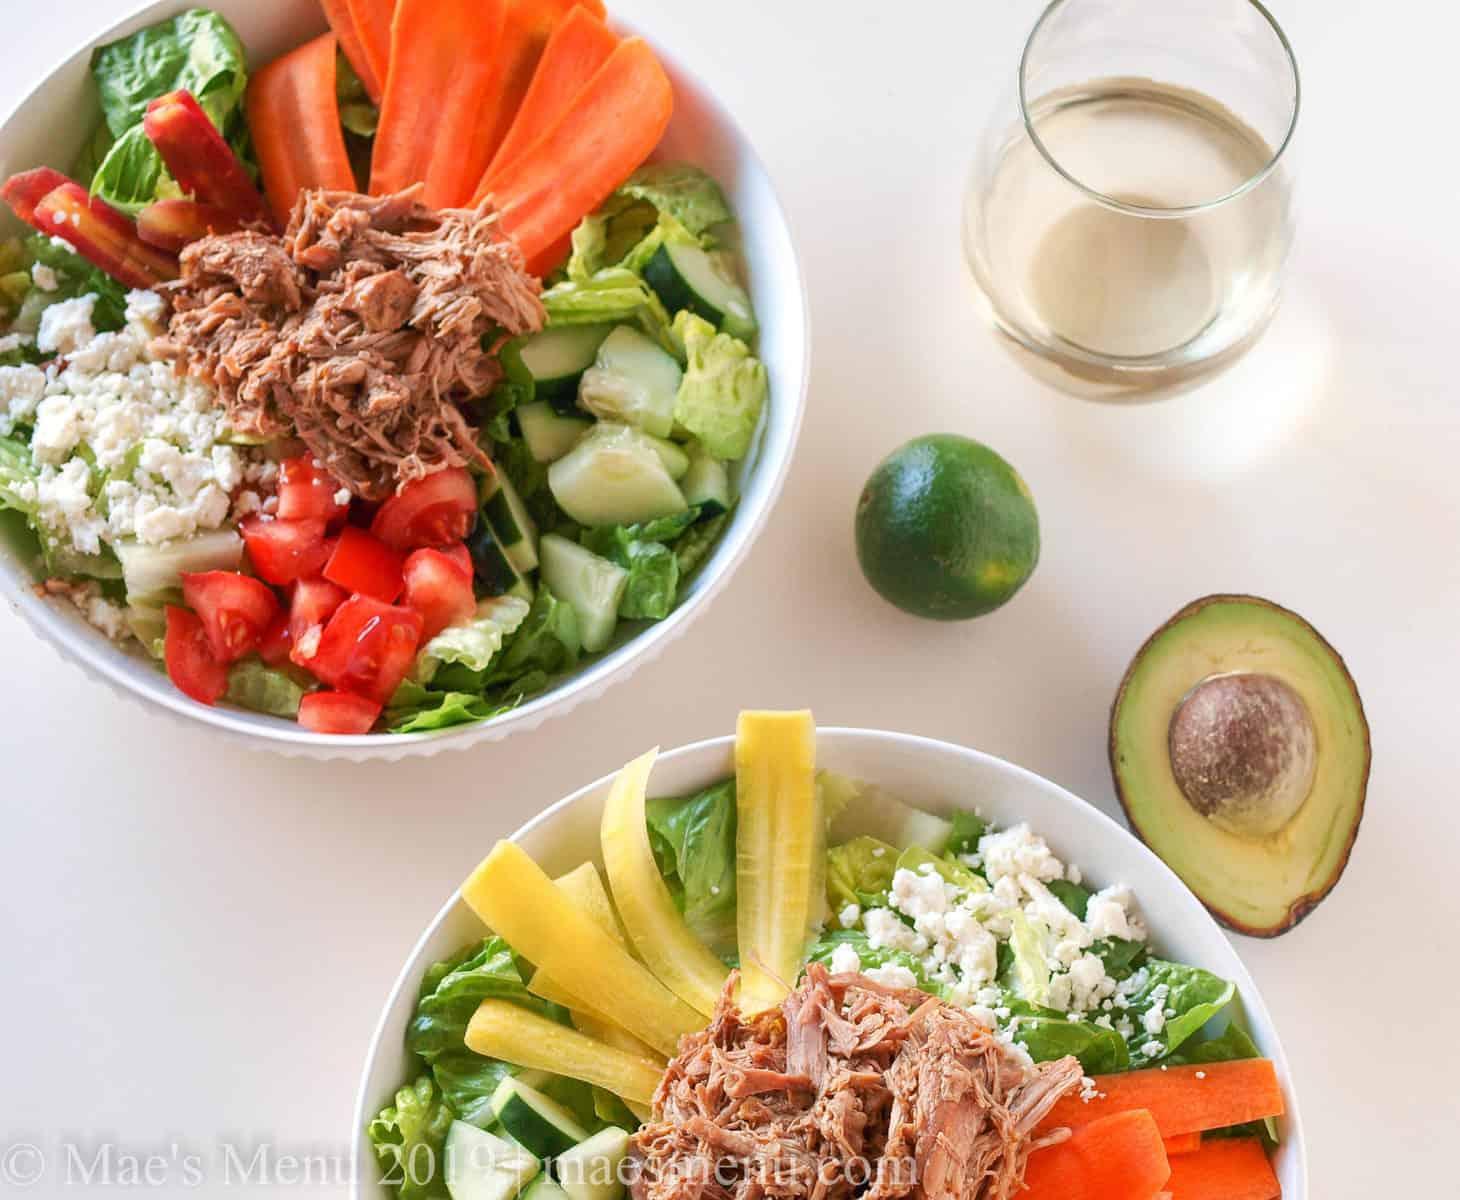 Turkey carnitas bowls next to an avocado, lime, and white wine.